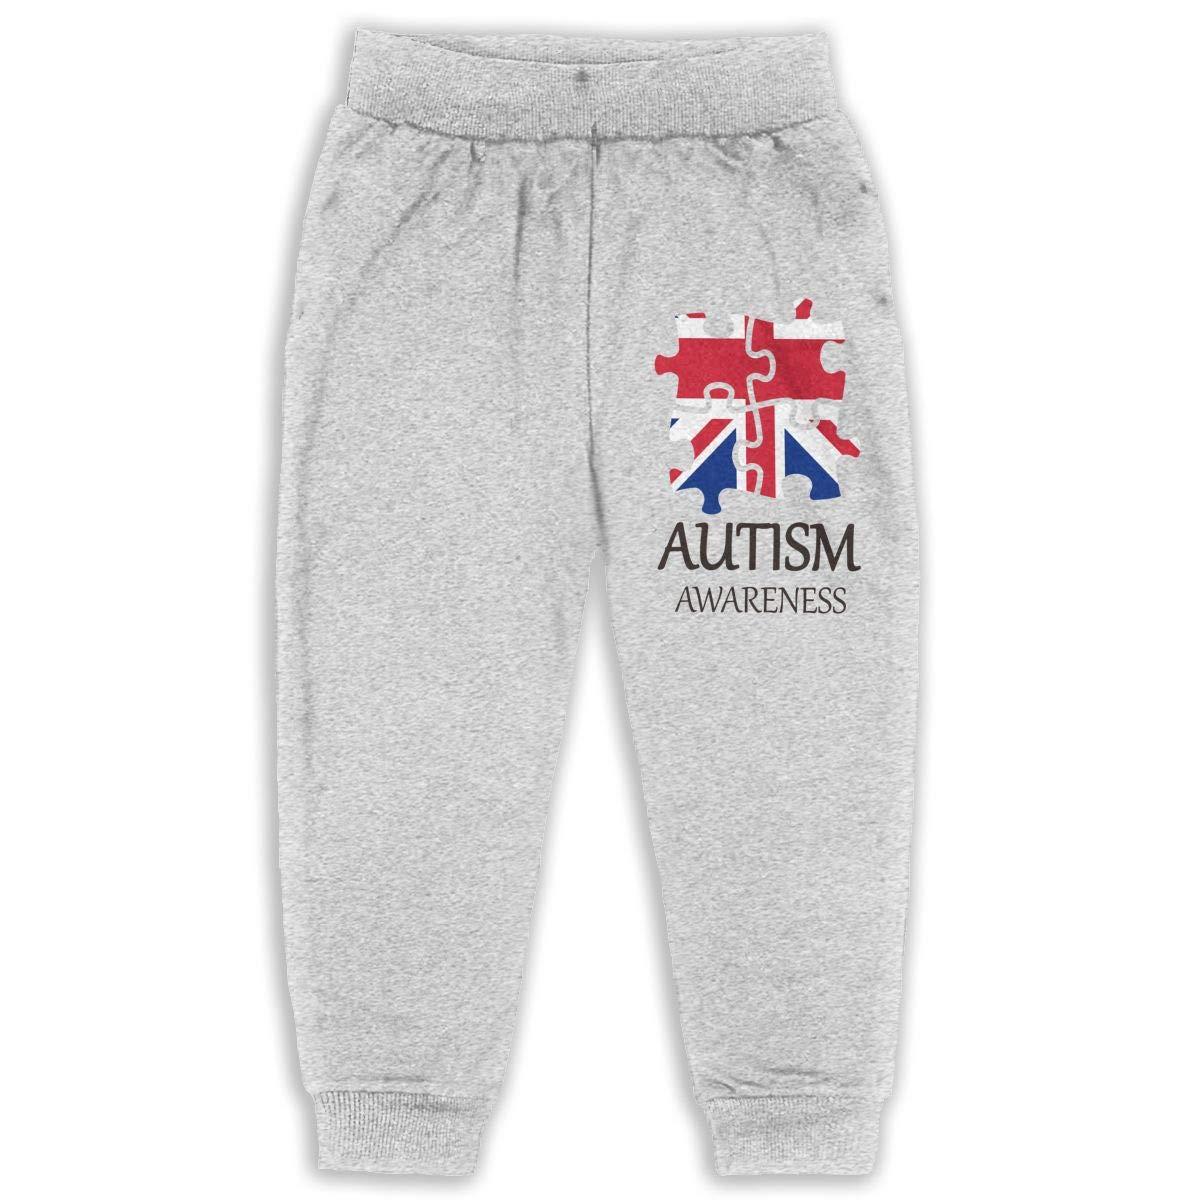 Udyi/&Jln-97 British Flag World Autism Awareness Day 2 Kids /& Toddler Sweatpants Soft Cozy Girls Boys Jogger Play Pant